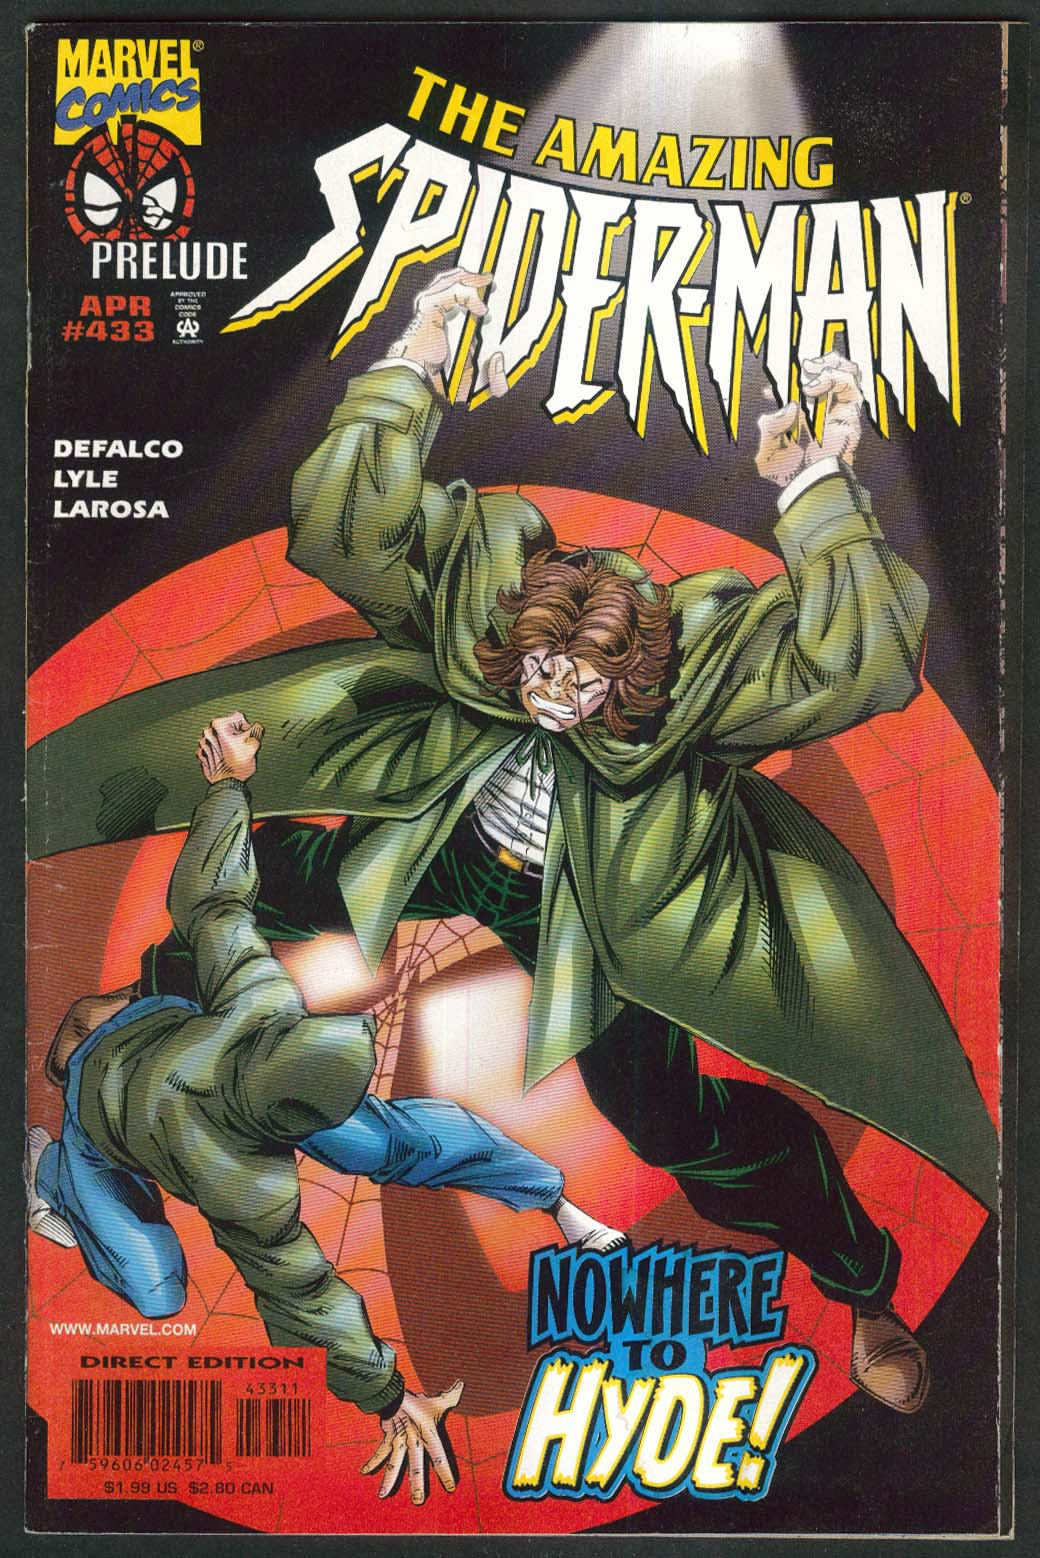 AMAZING SPIDER-MAN #433 Marvel comic book 4 1998